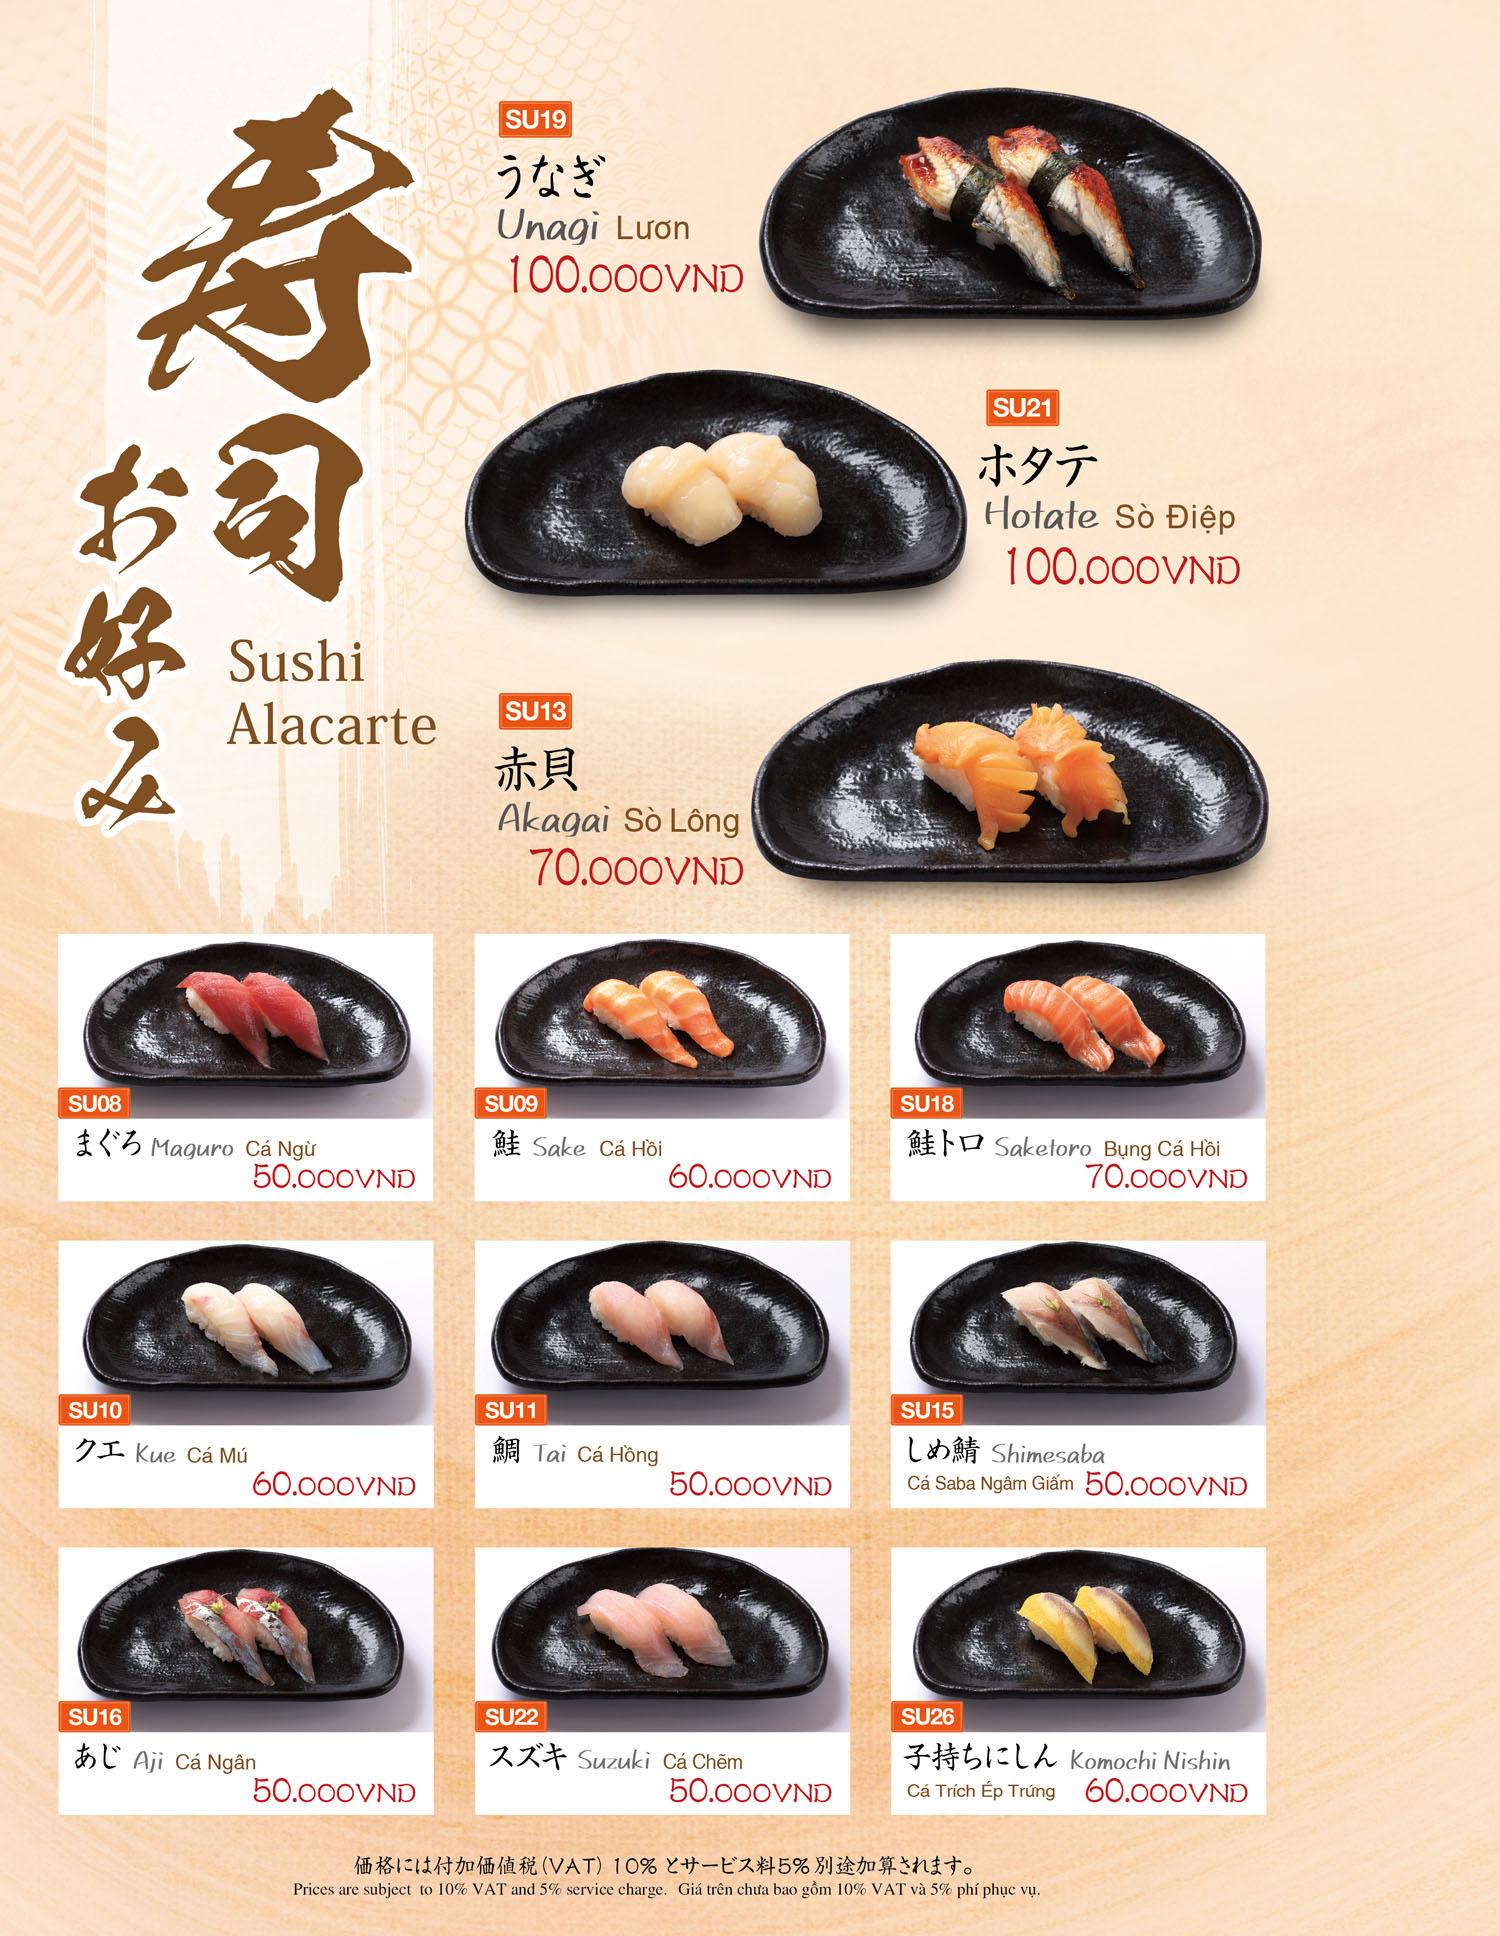 Sushi Alacarrte